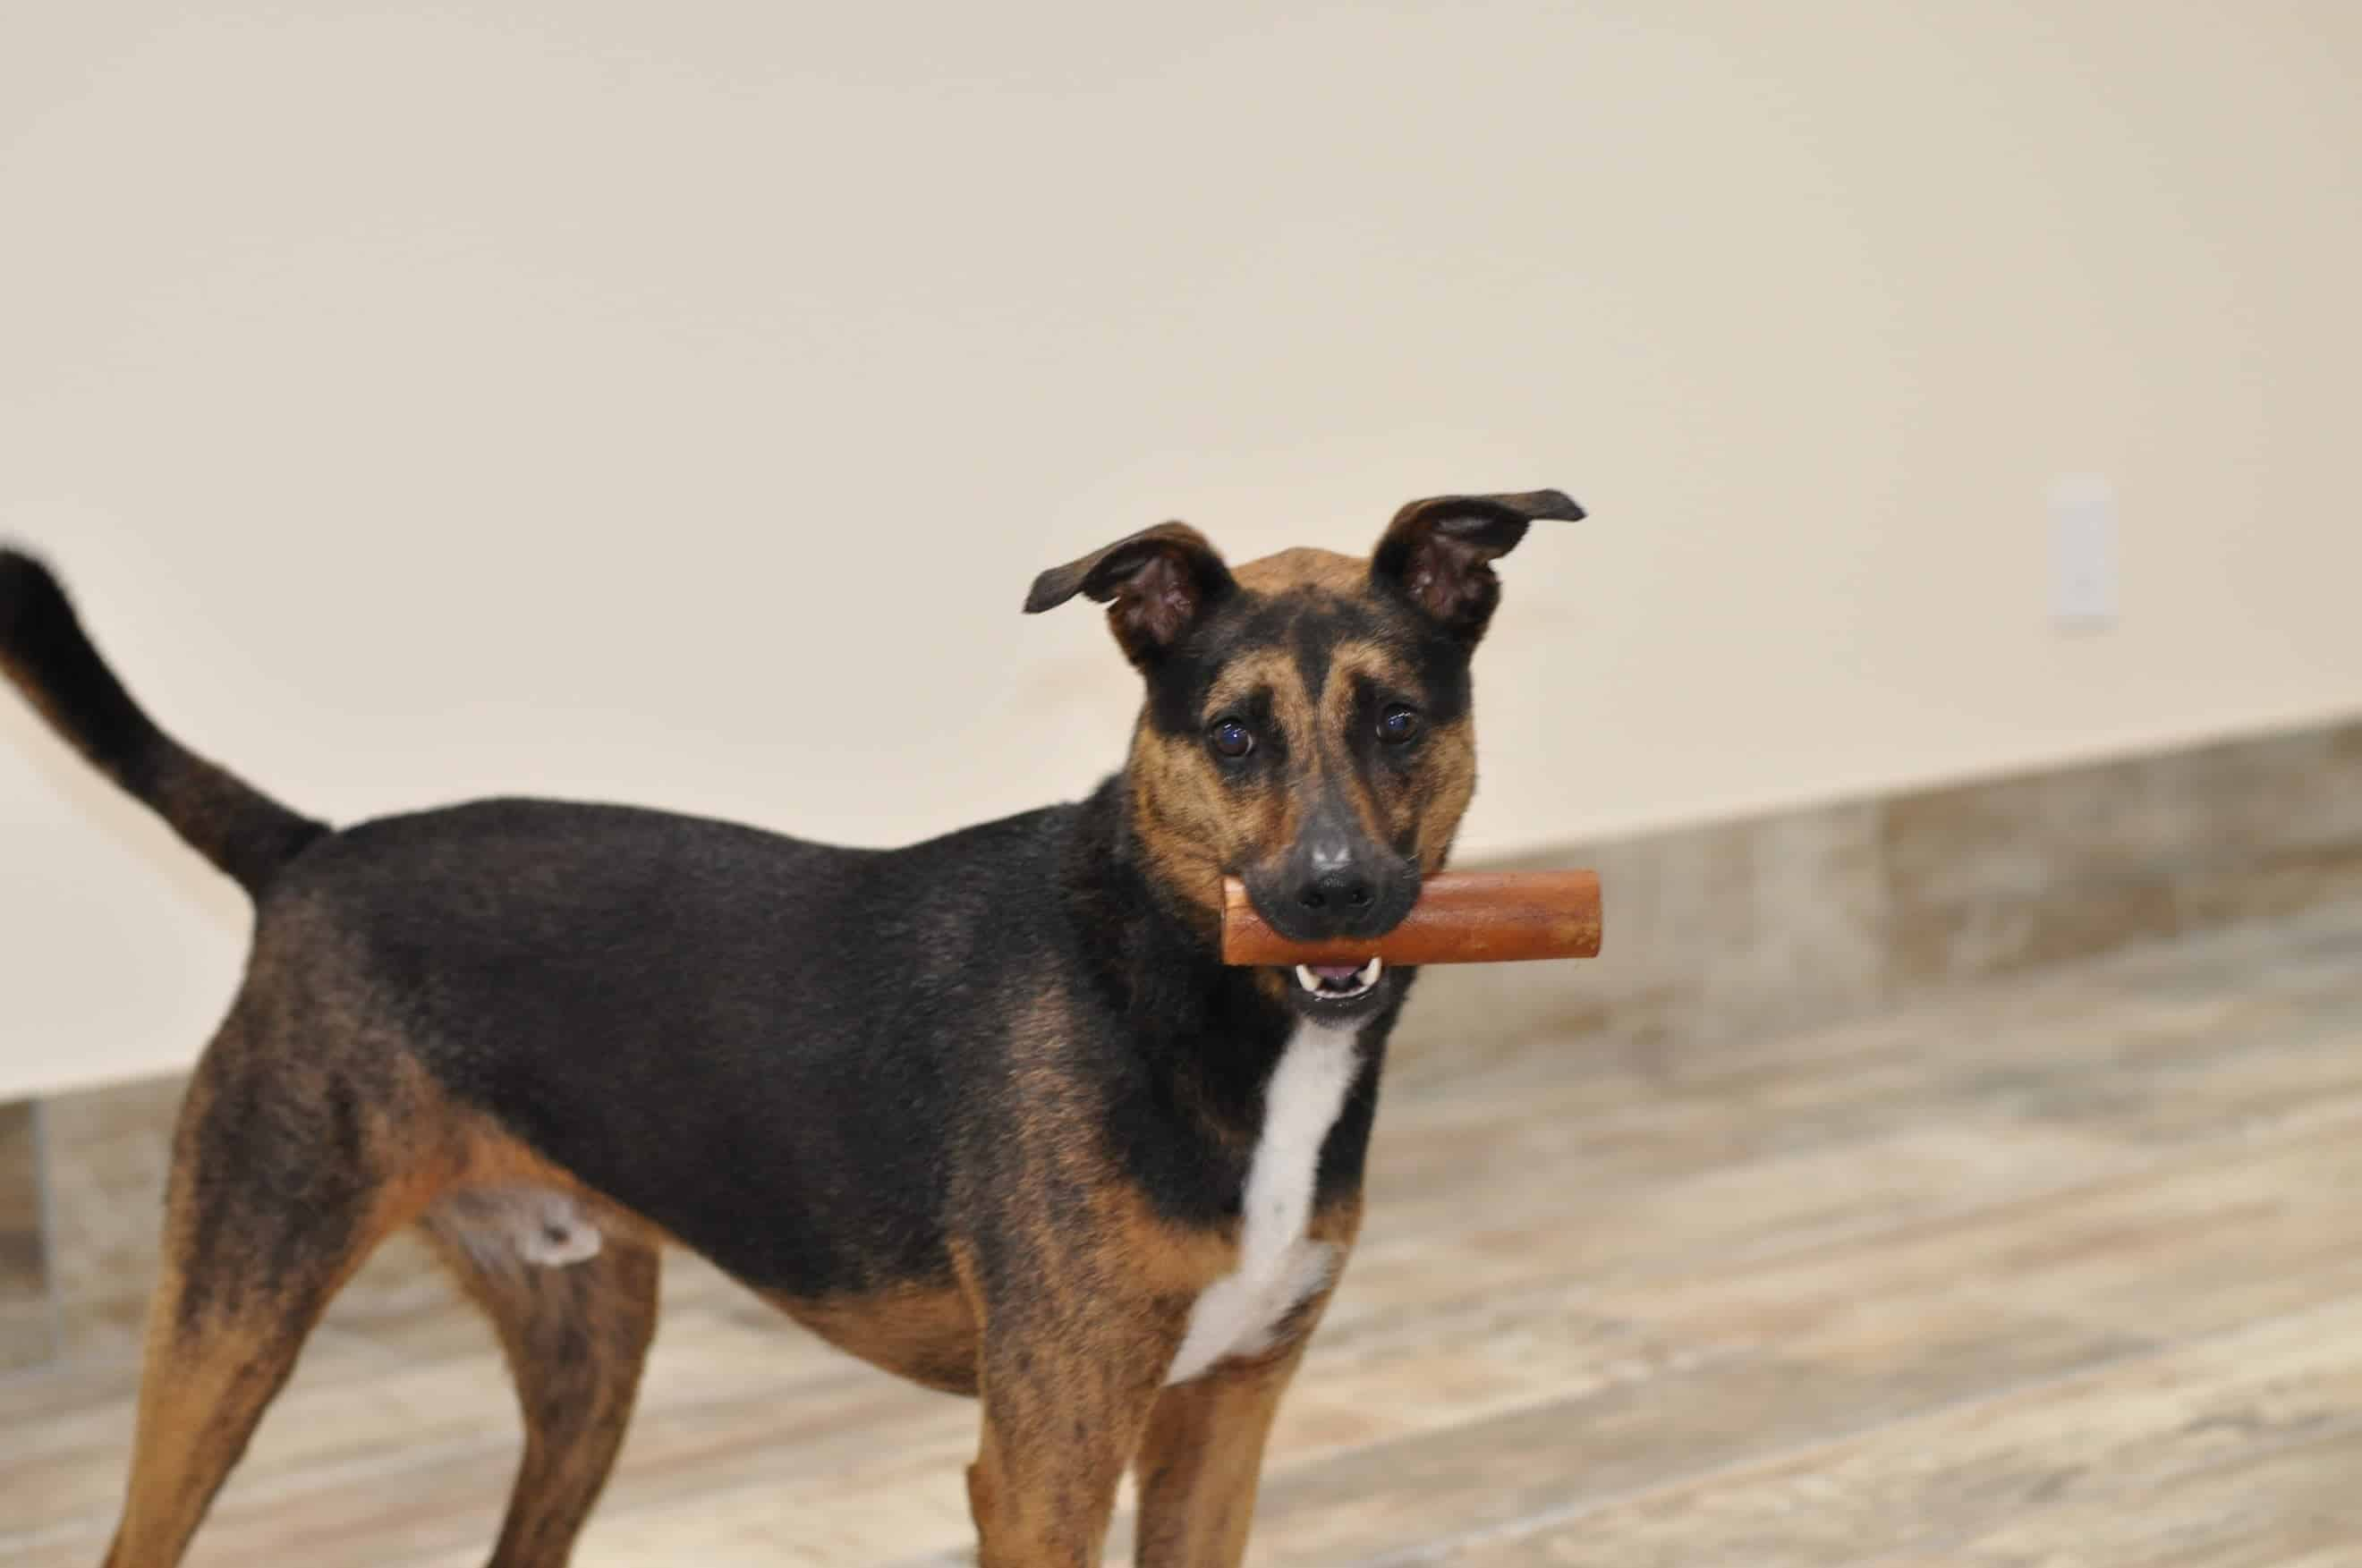 Dog holding a bone